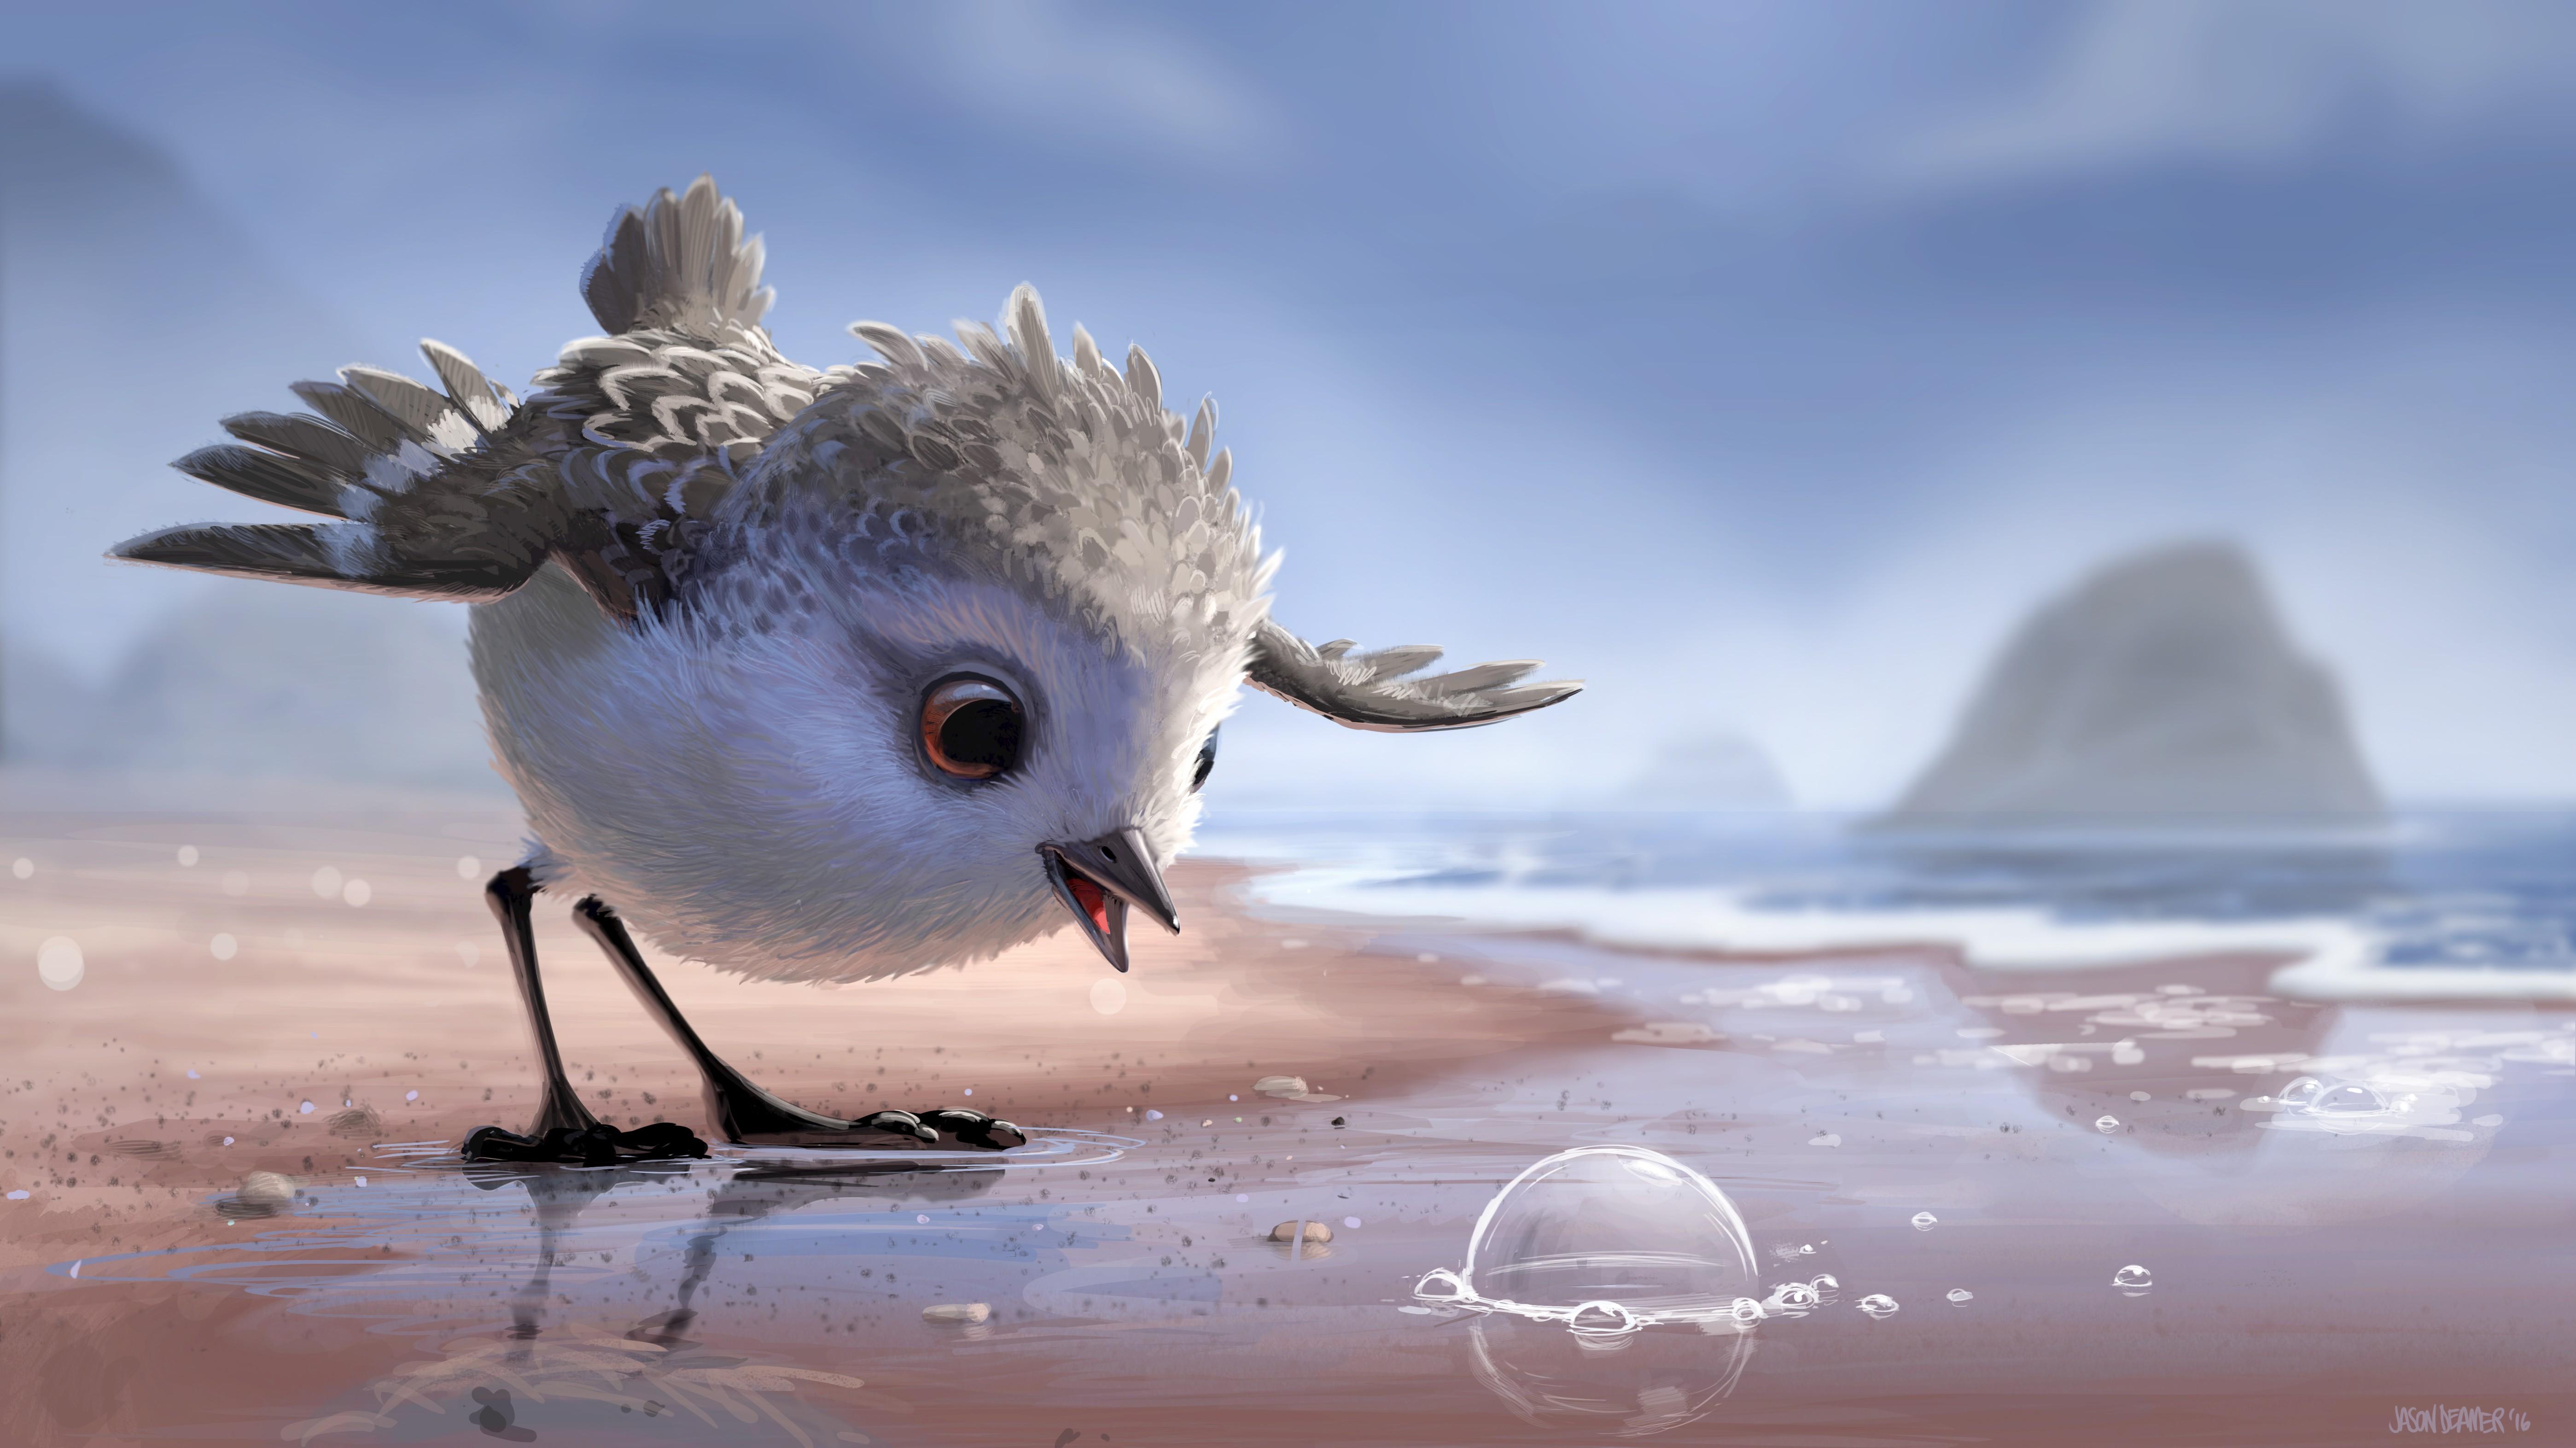 Wallpaper Burung Burung Refleksi Musim Dingin Gambar